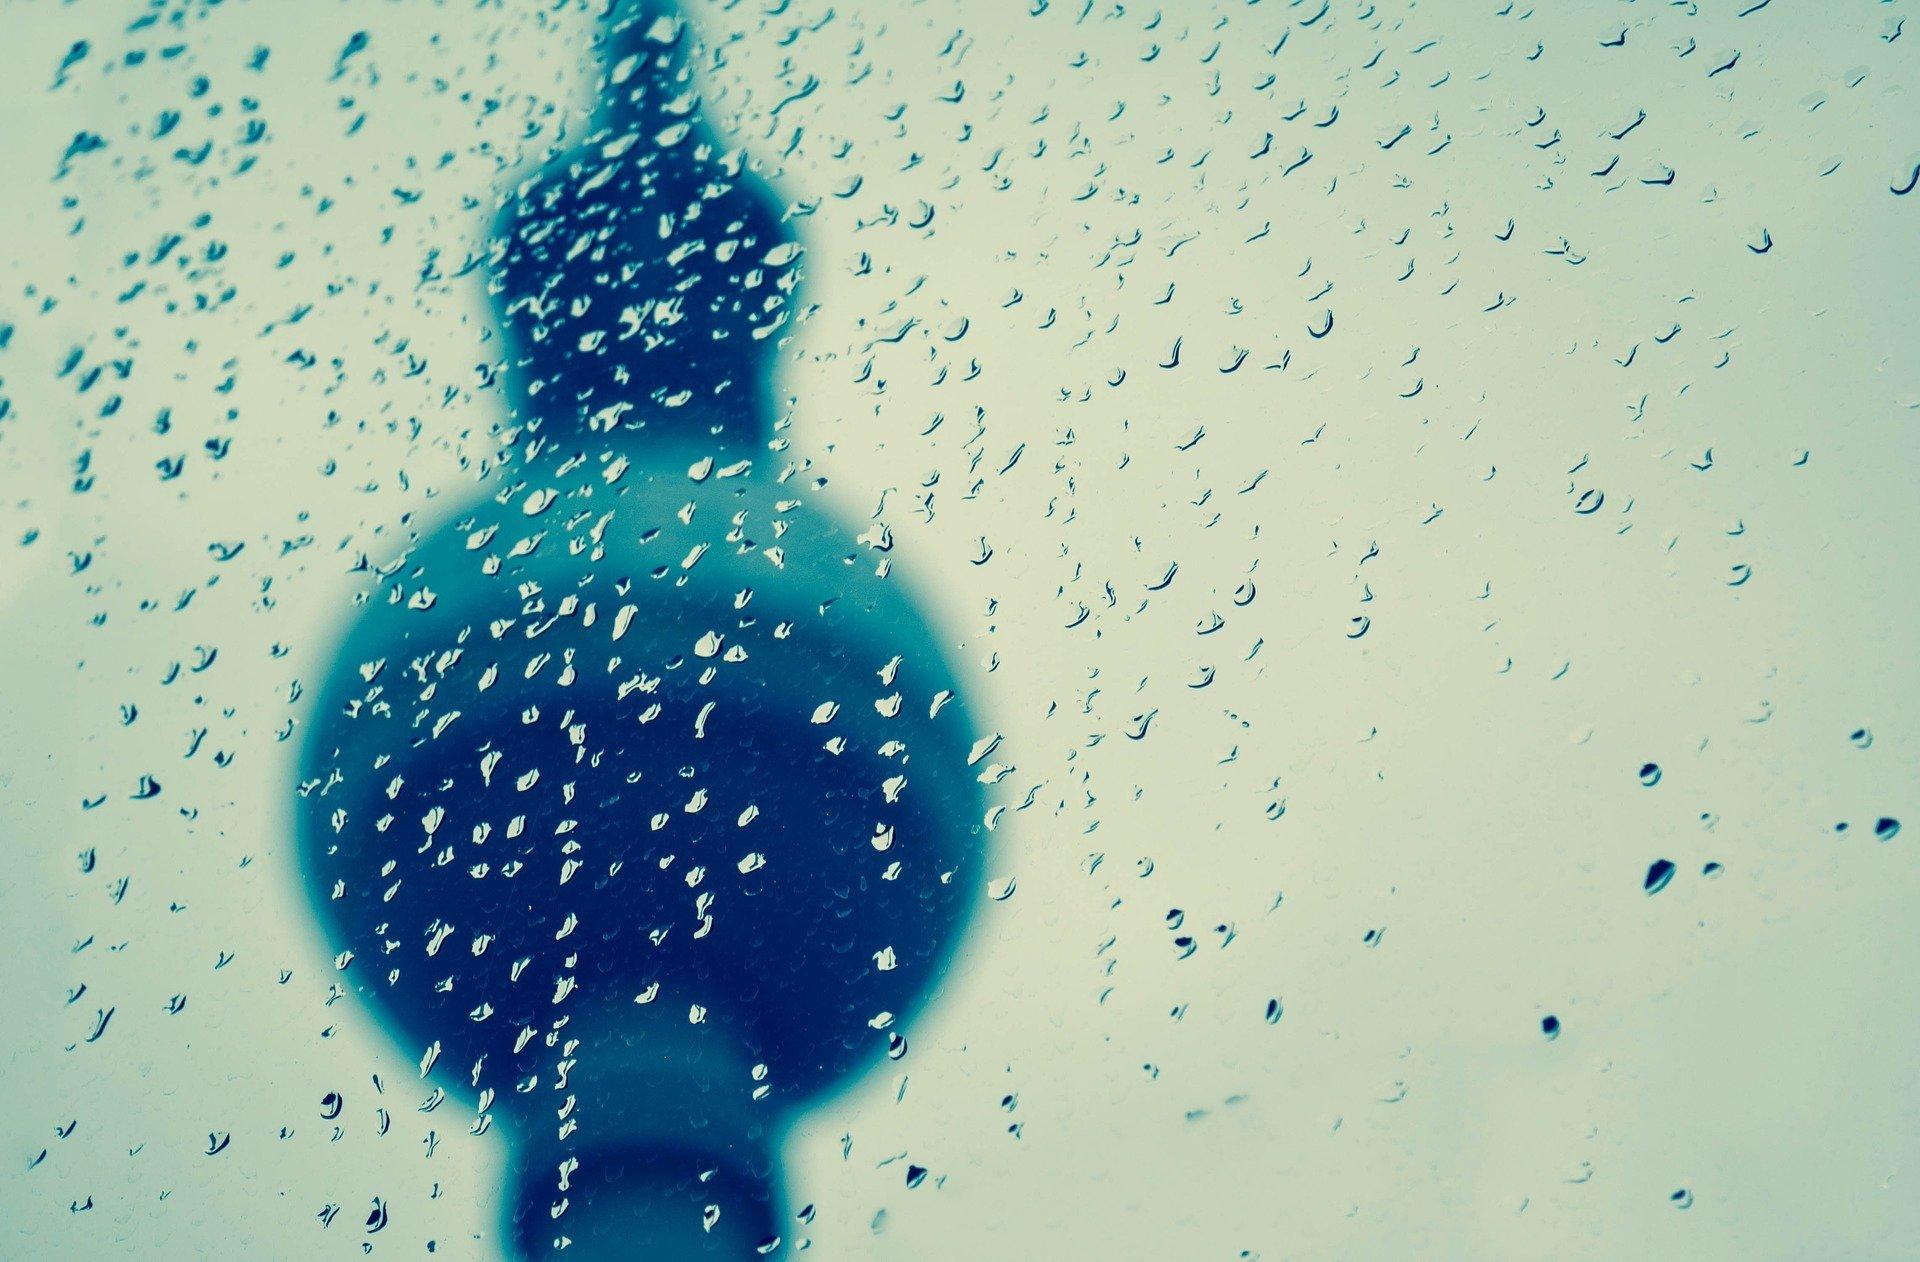 Regen Fernsehturm